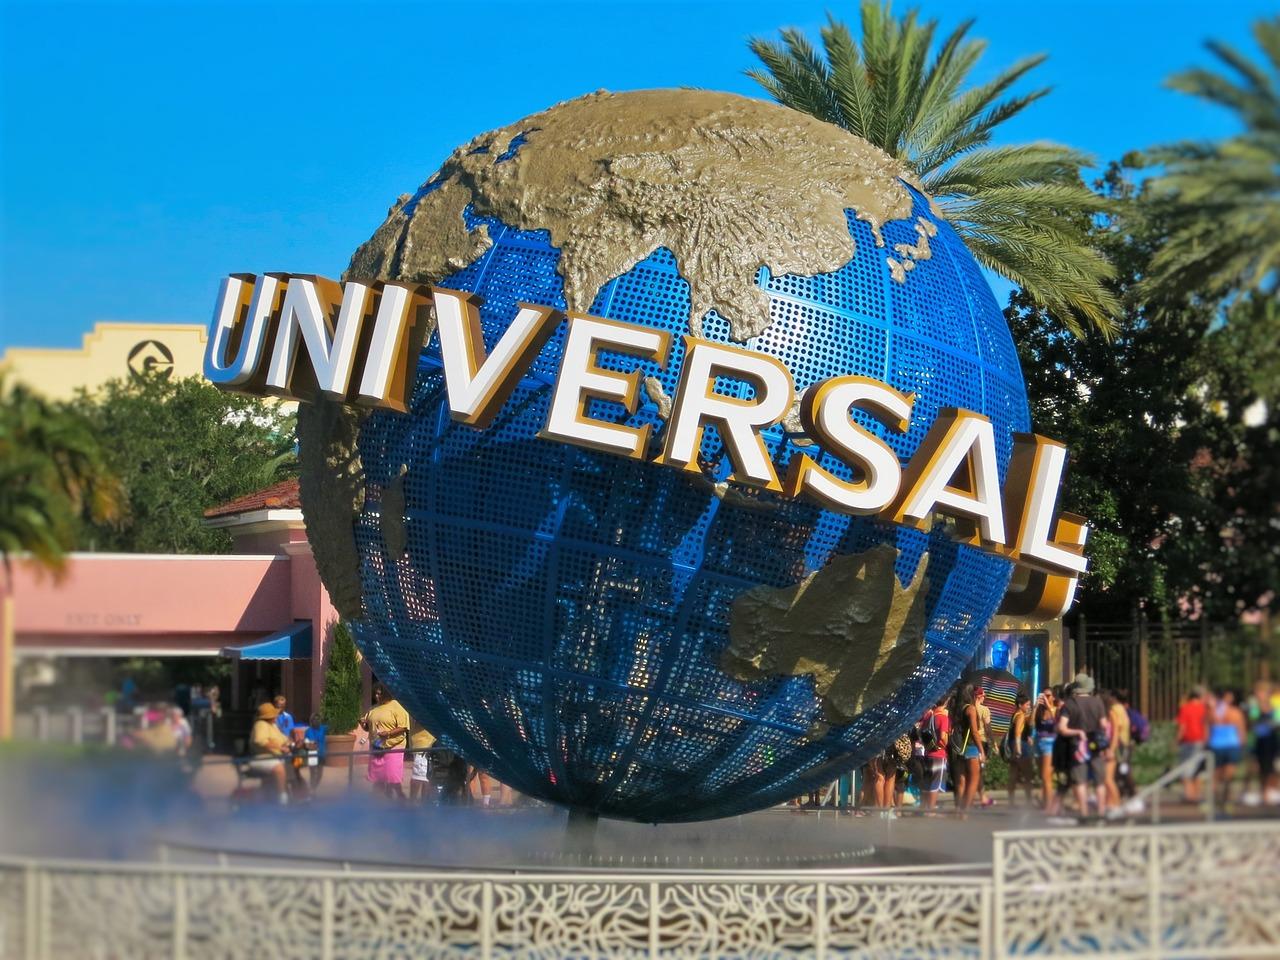 universal-studios-1640516_1280.jpg